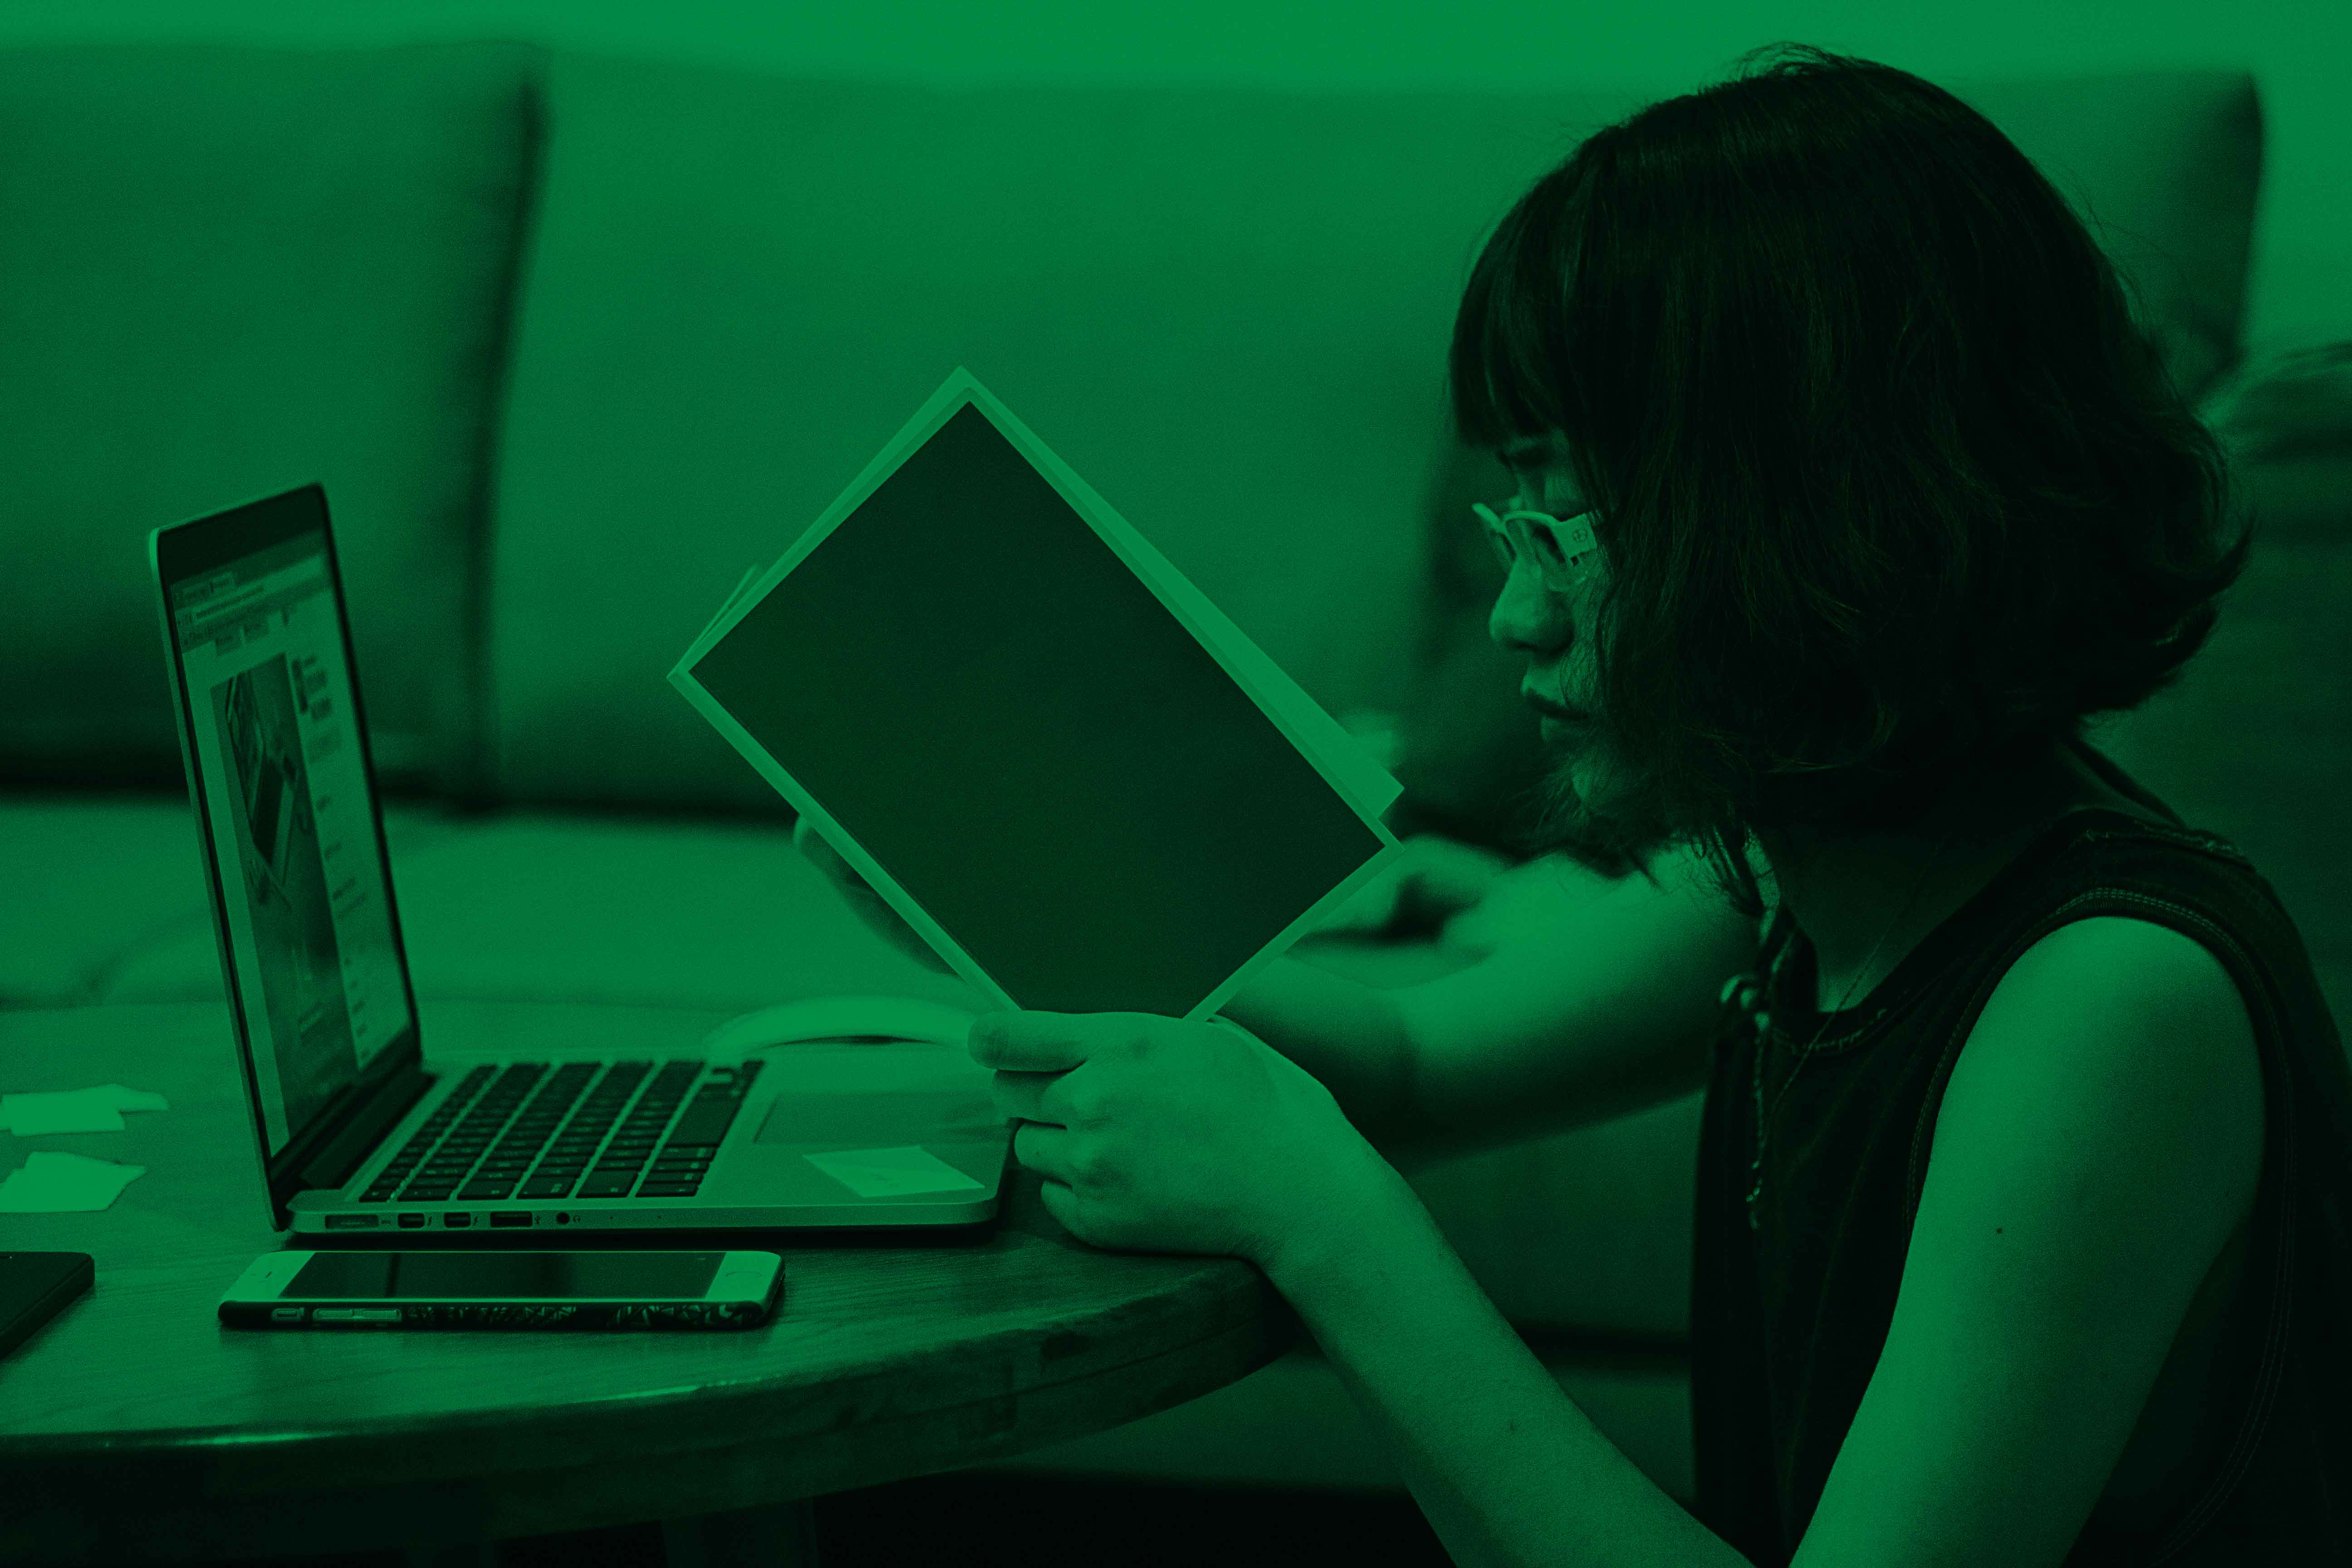 woman book laptop_green.jpg